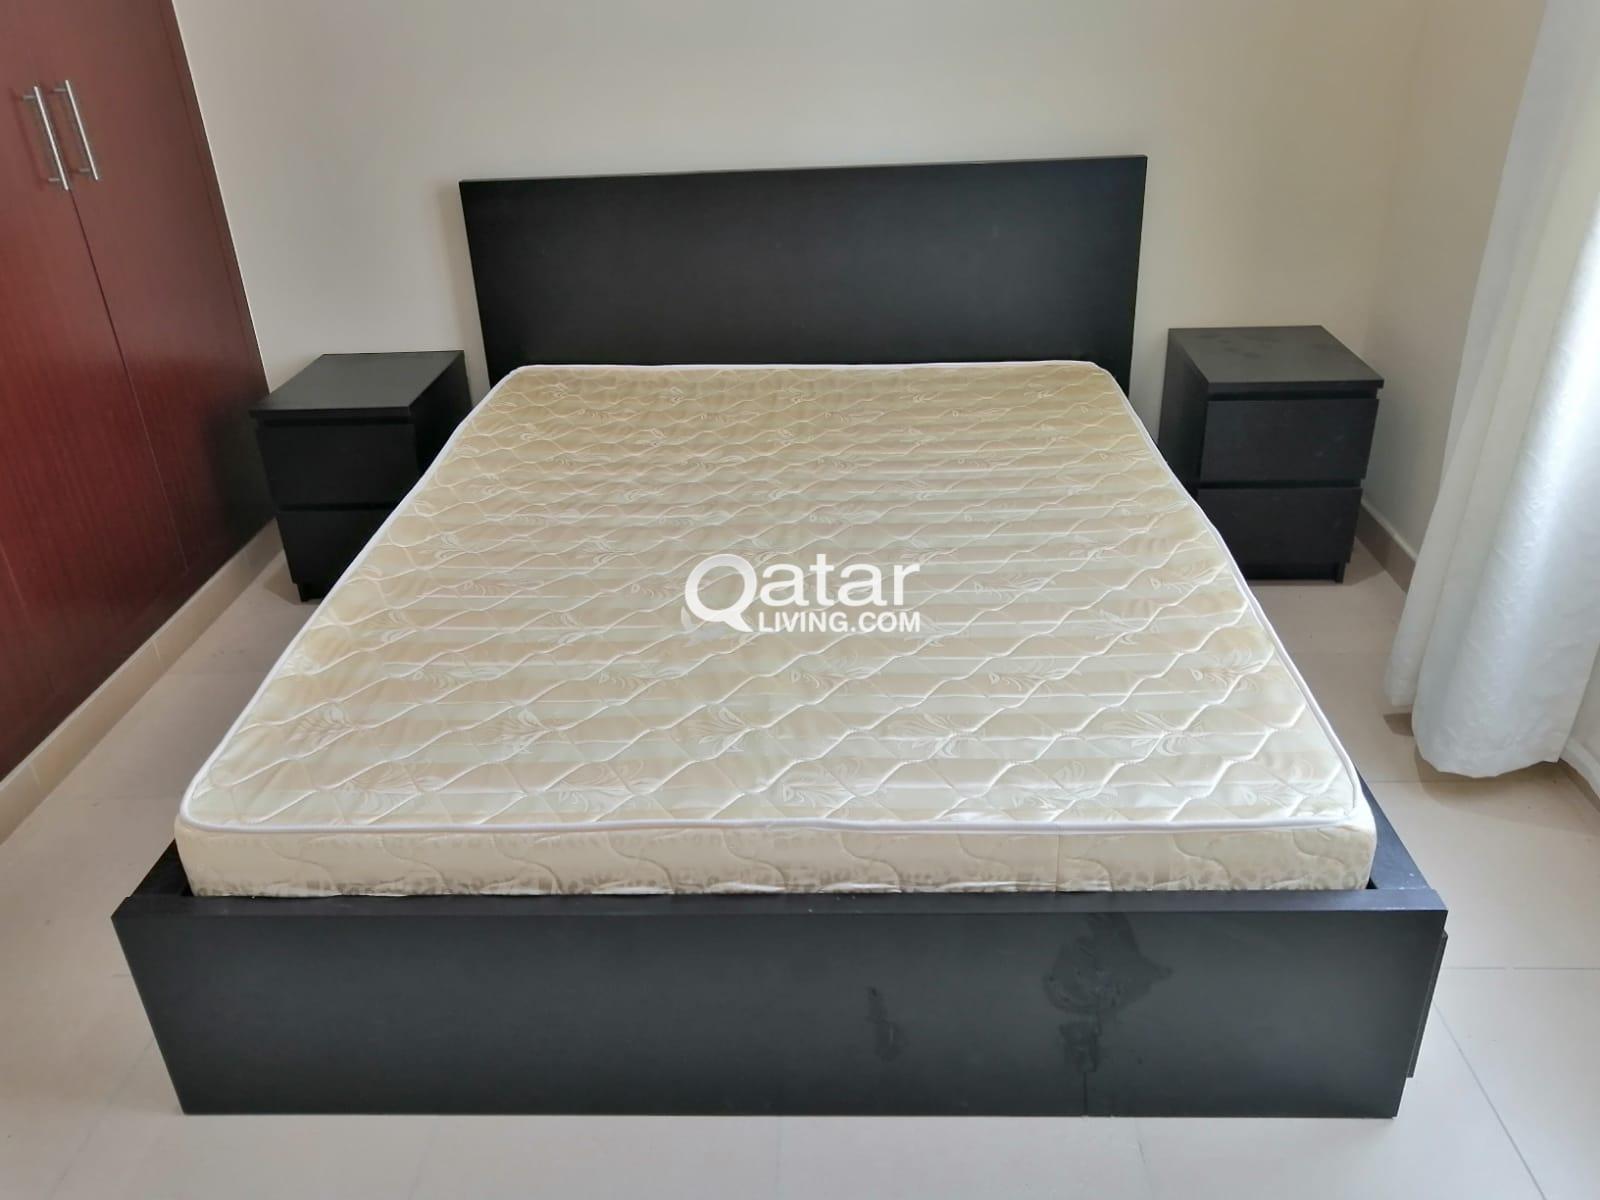 Ikea Malm Bedroom Set Qatar Living